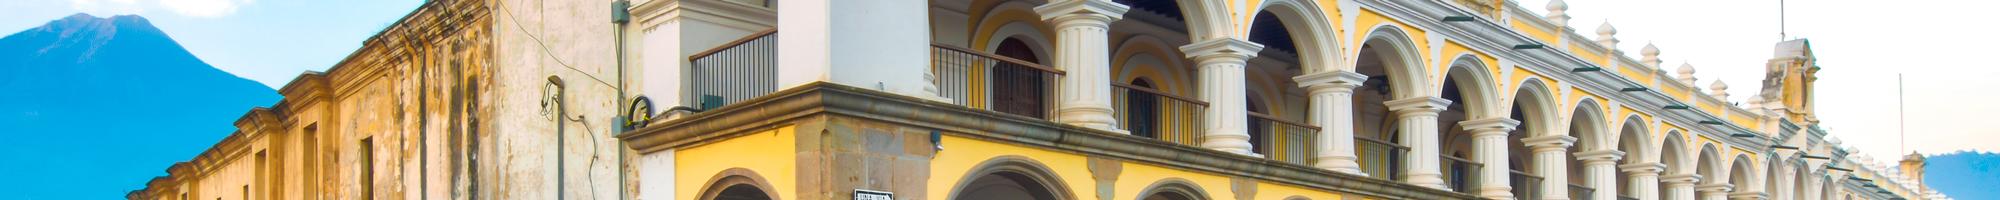 4 hoteles con piscina climatizada en ciudad de guatemala guatemala hoteles en b the travel brand - Hoteles con piscina climatizada en asturias ...